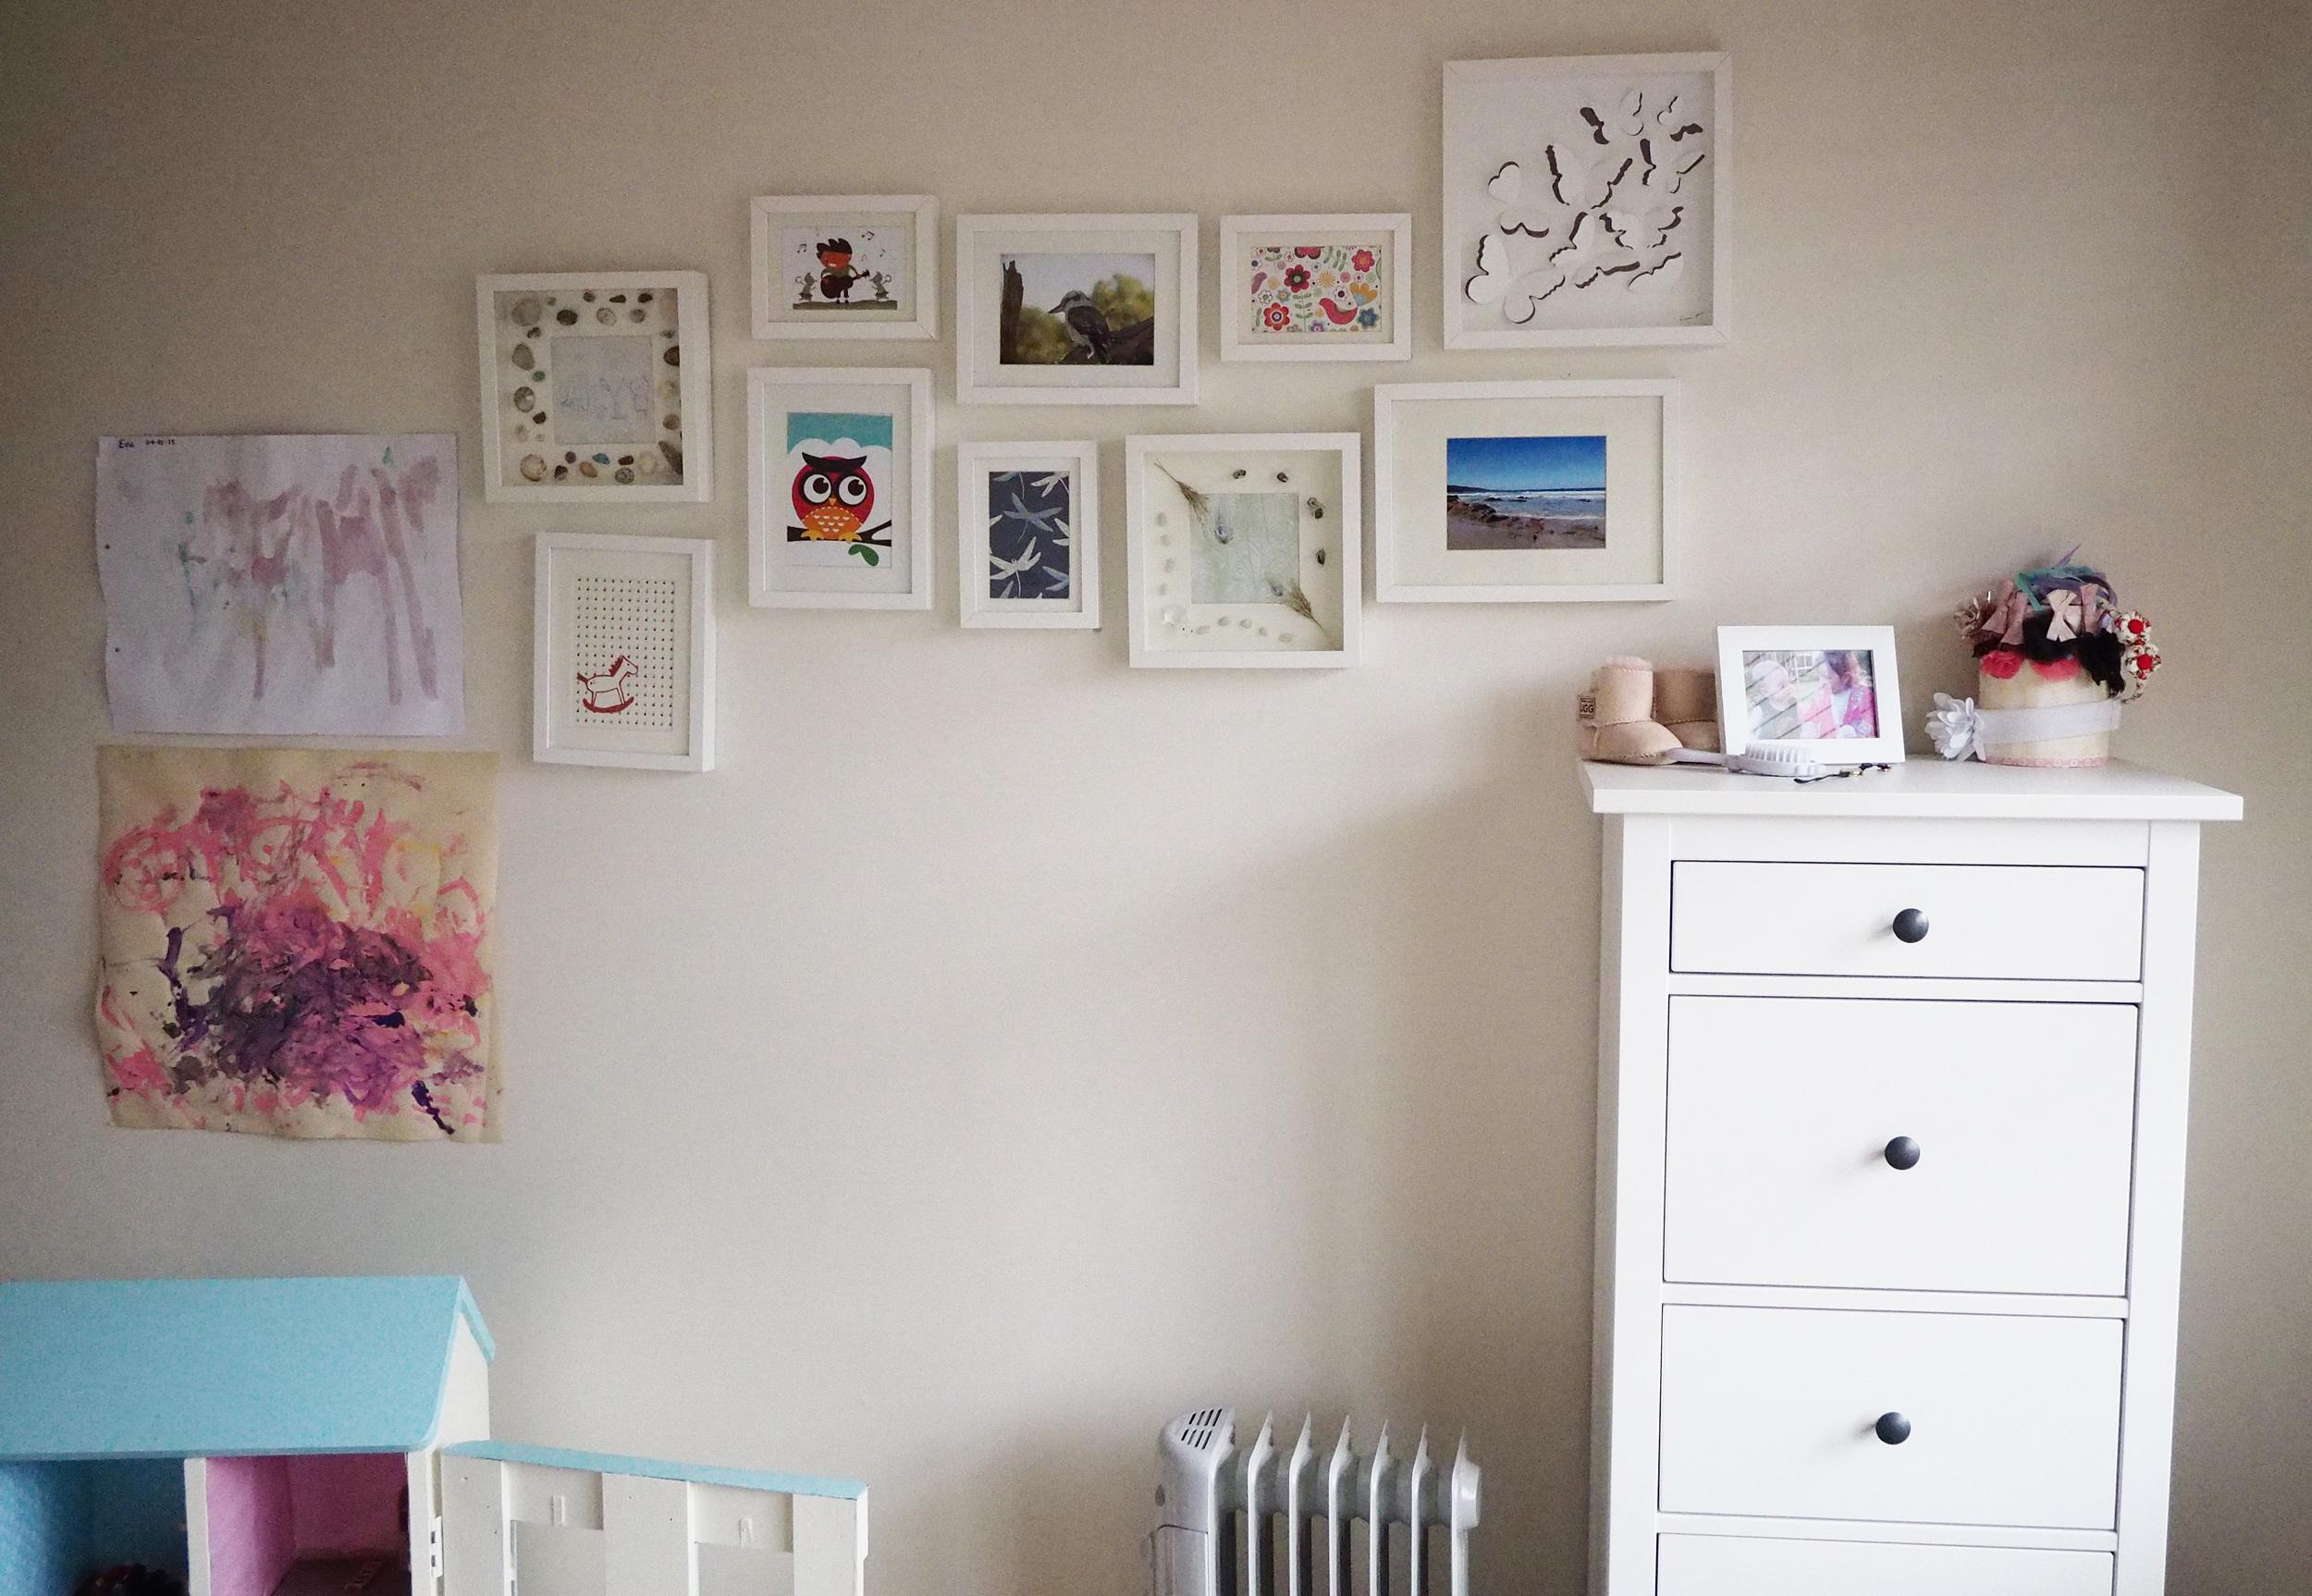 Bedroom photo gallery wall